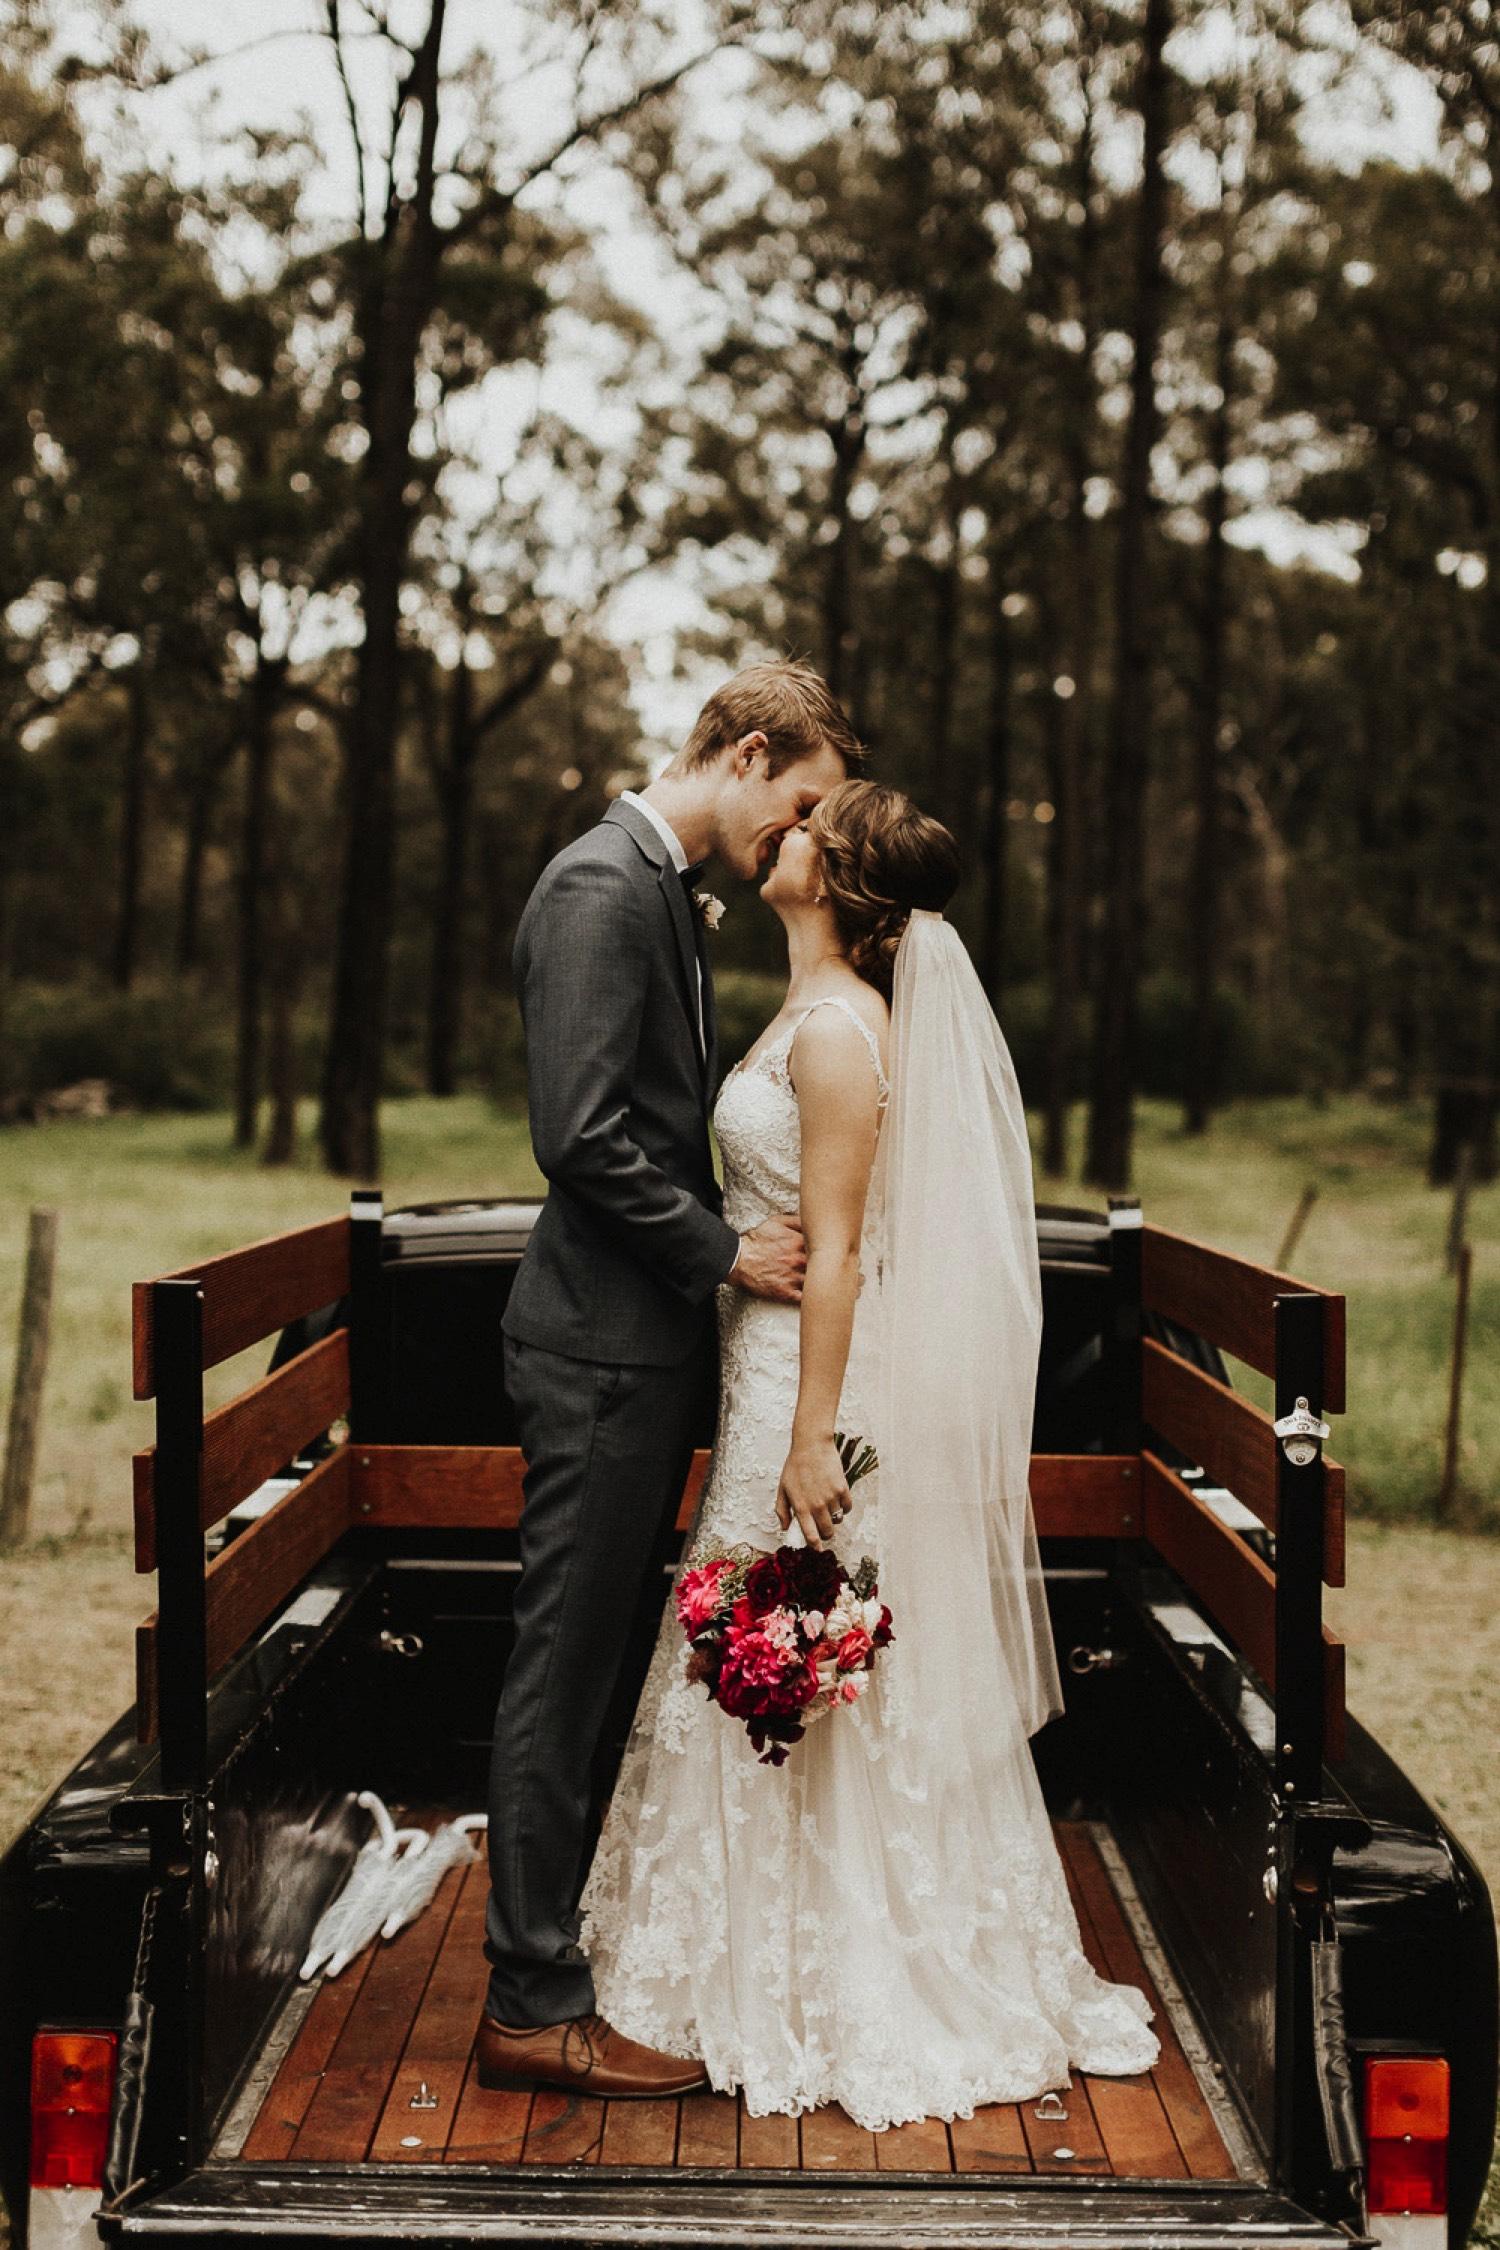 Rustic Country Wedding Photography 58.jpg